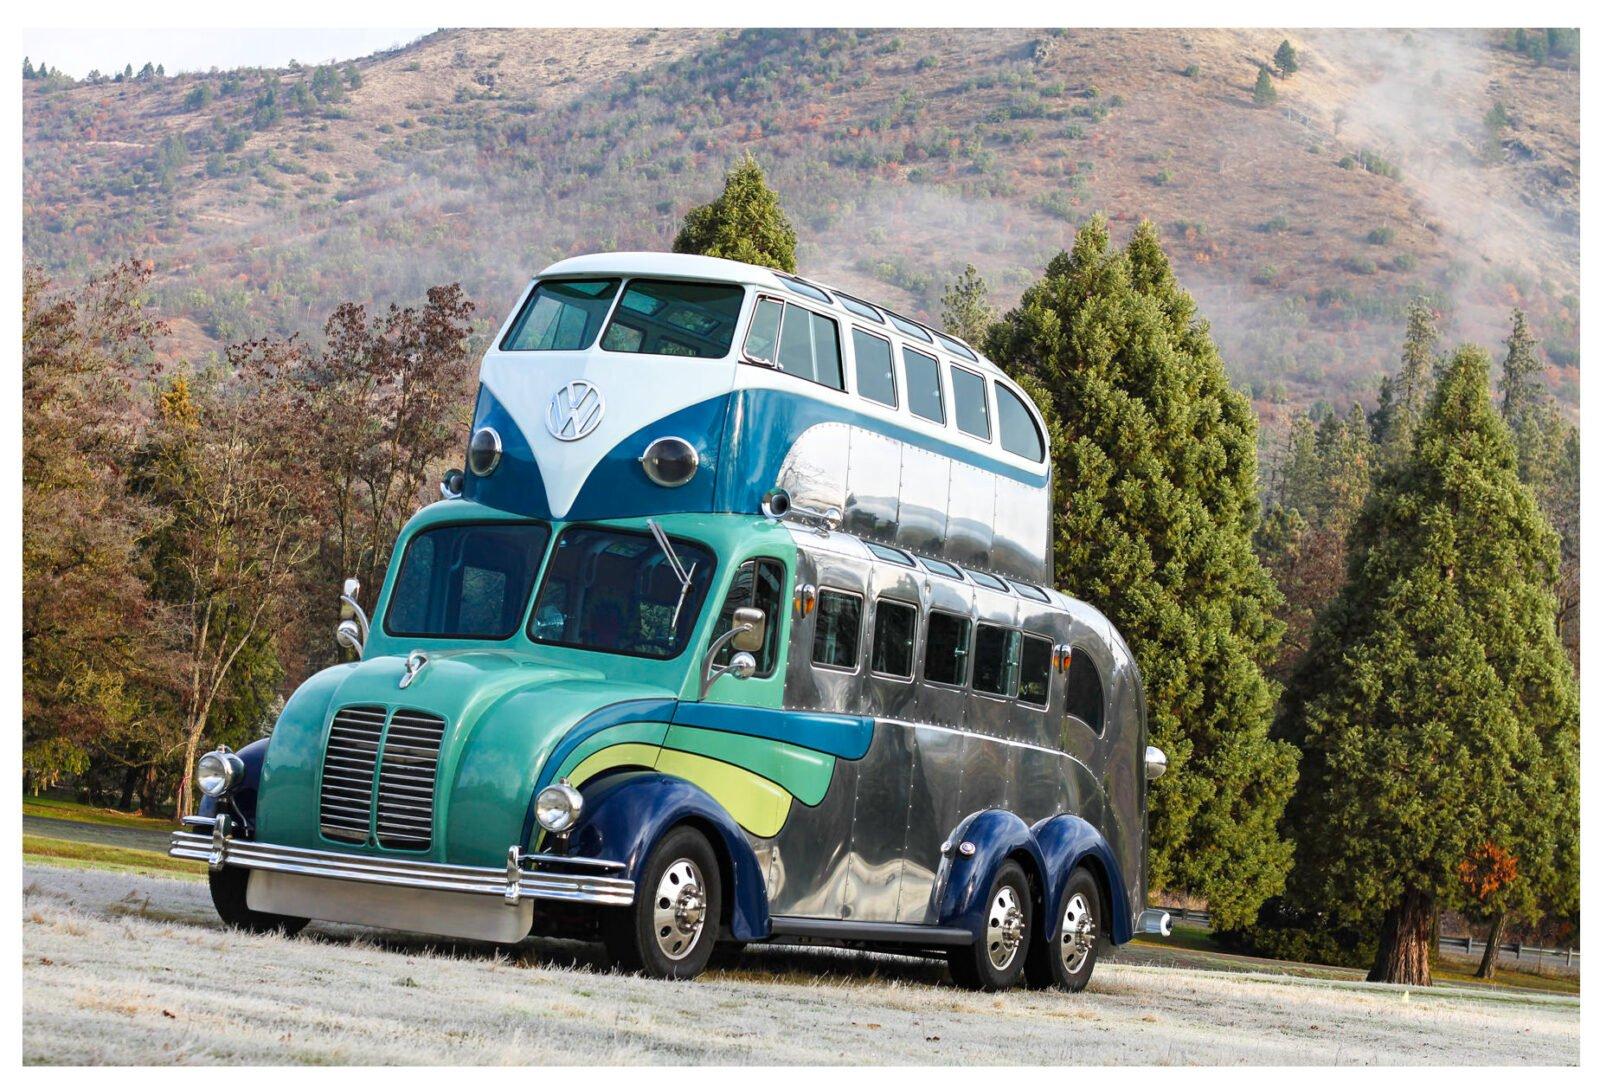 randy grubbs latest creation  magic bus